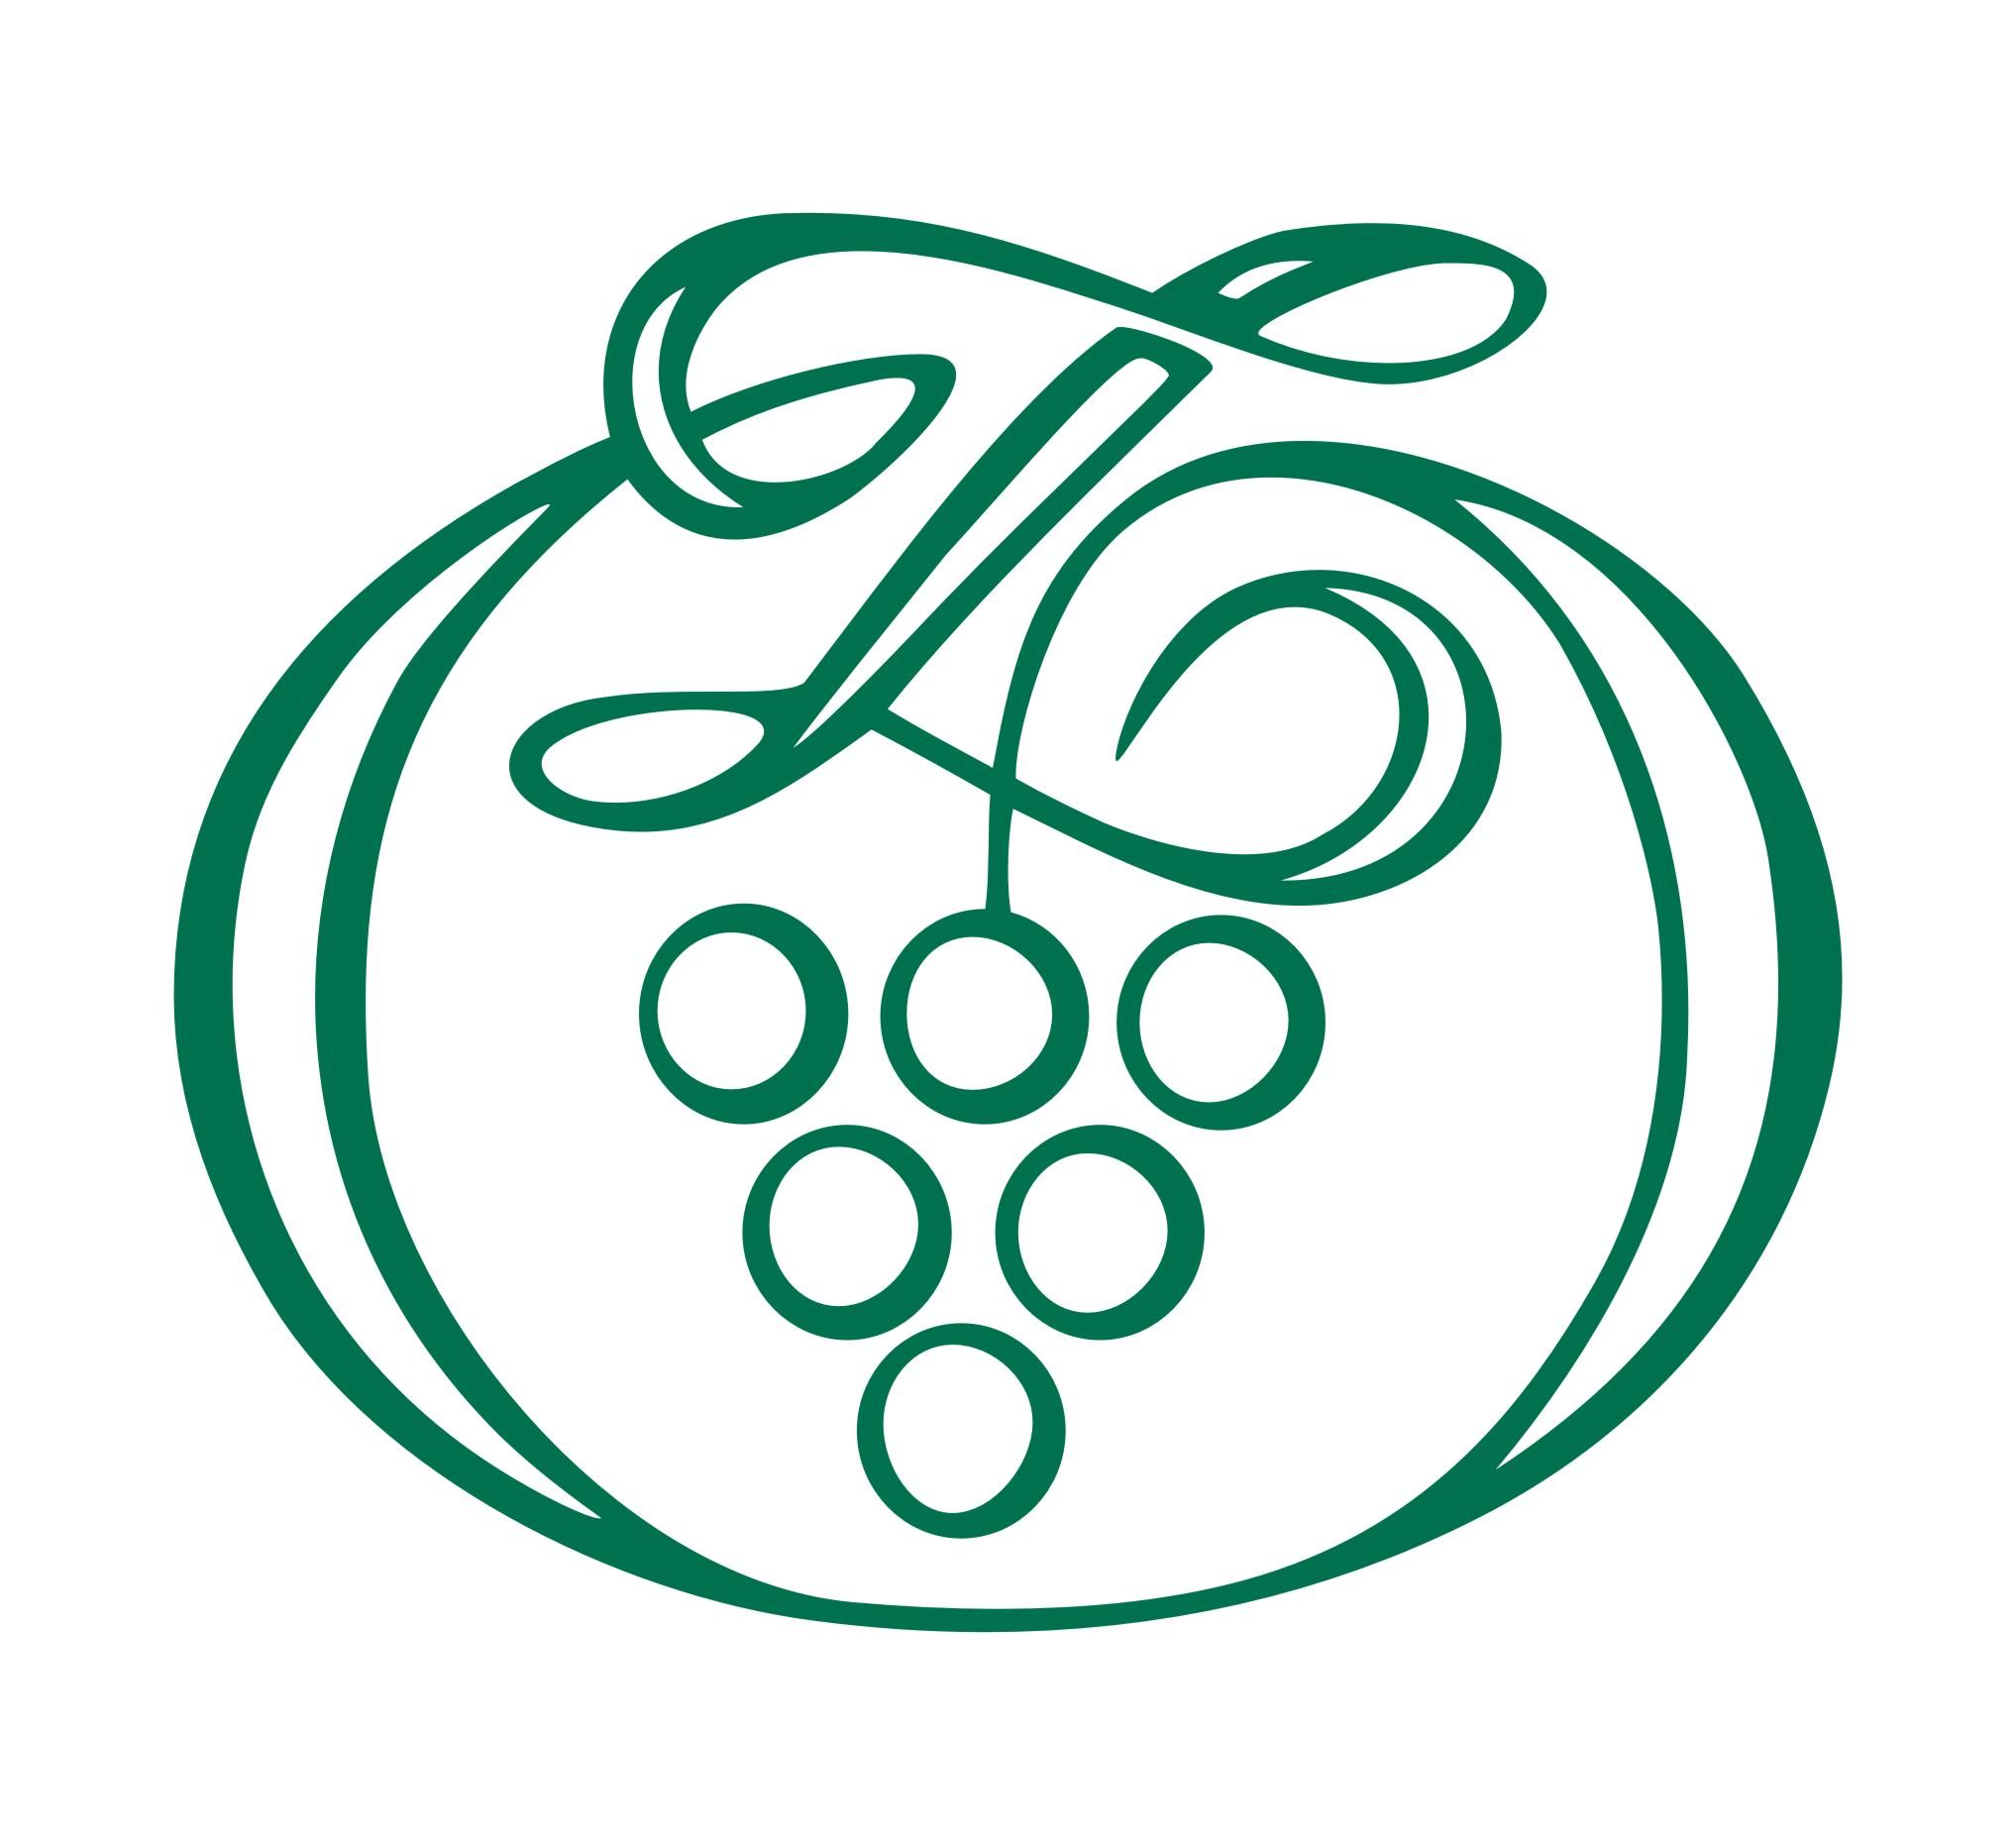 Znovín Znojmo - logo